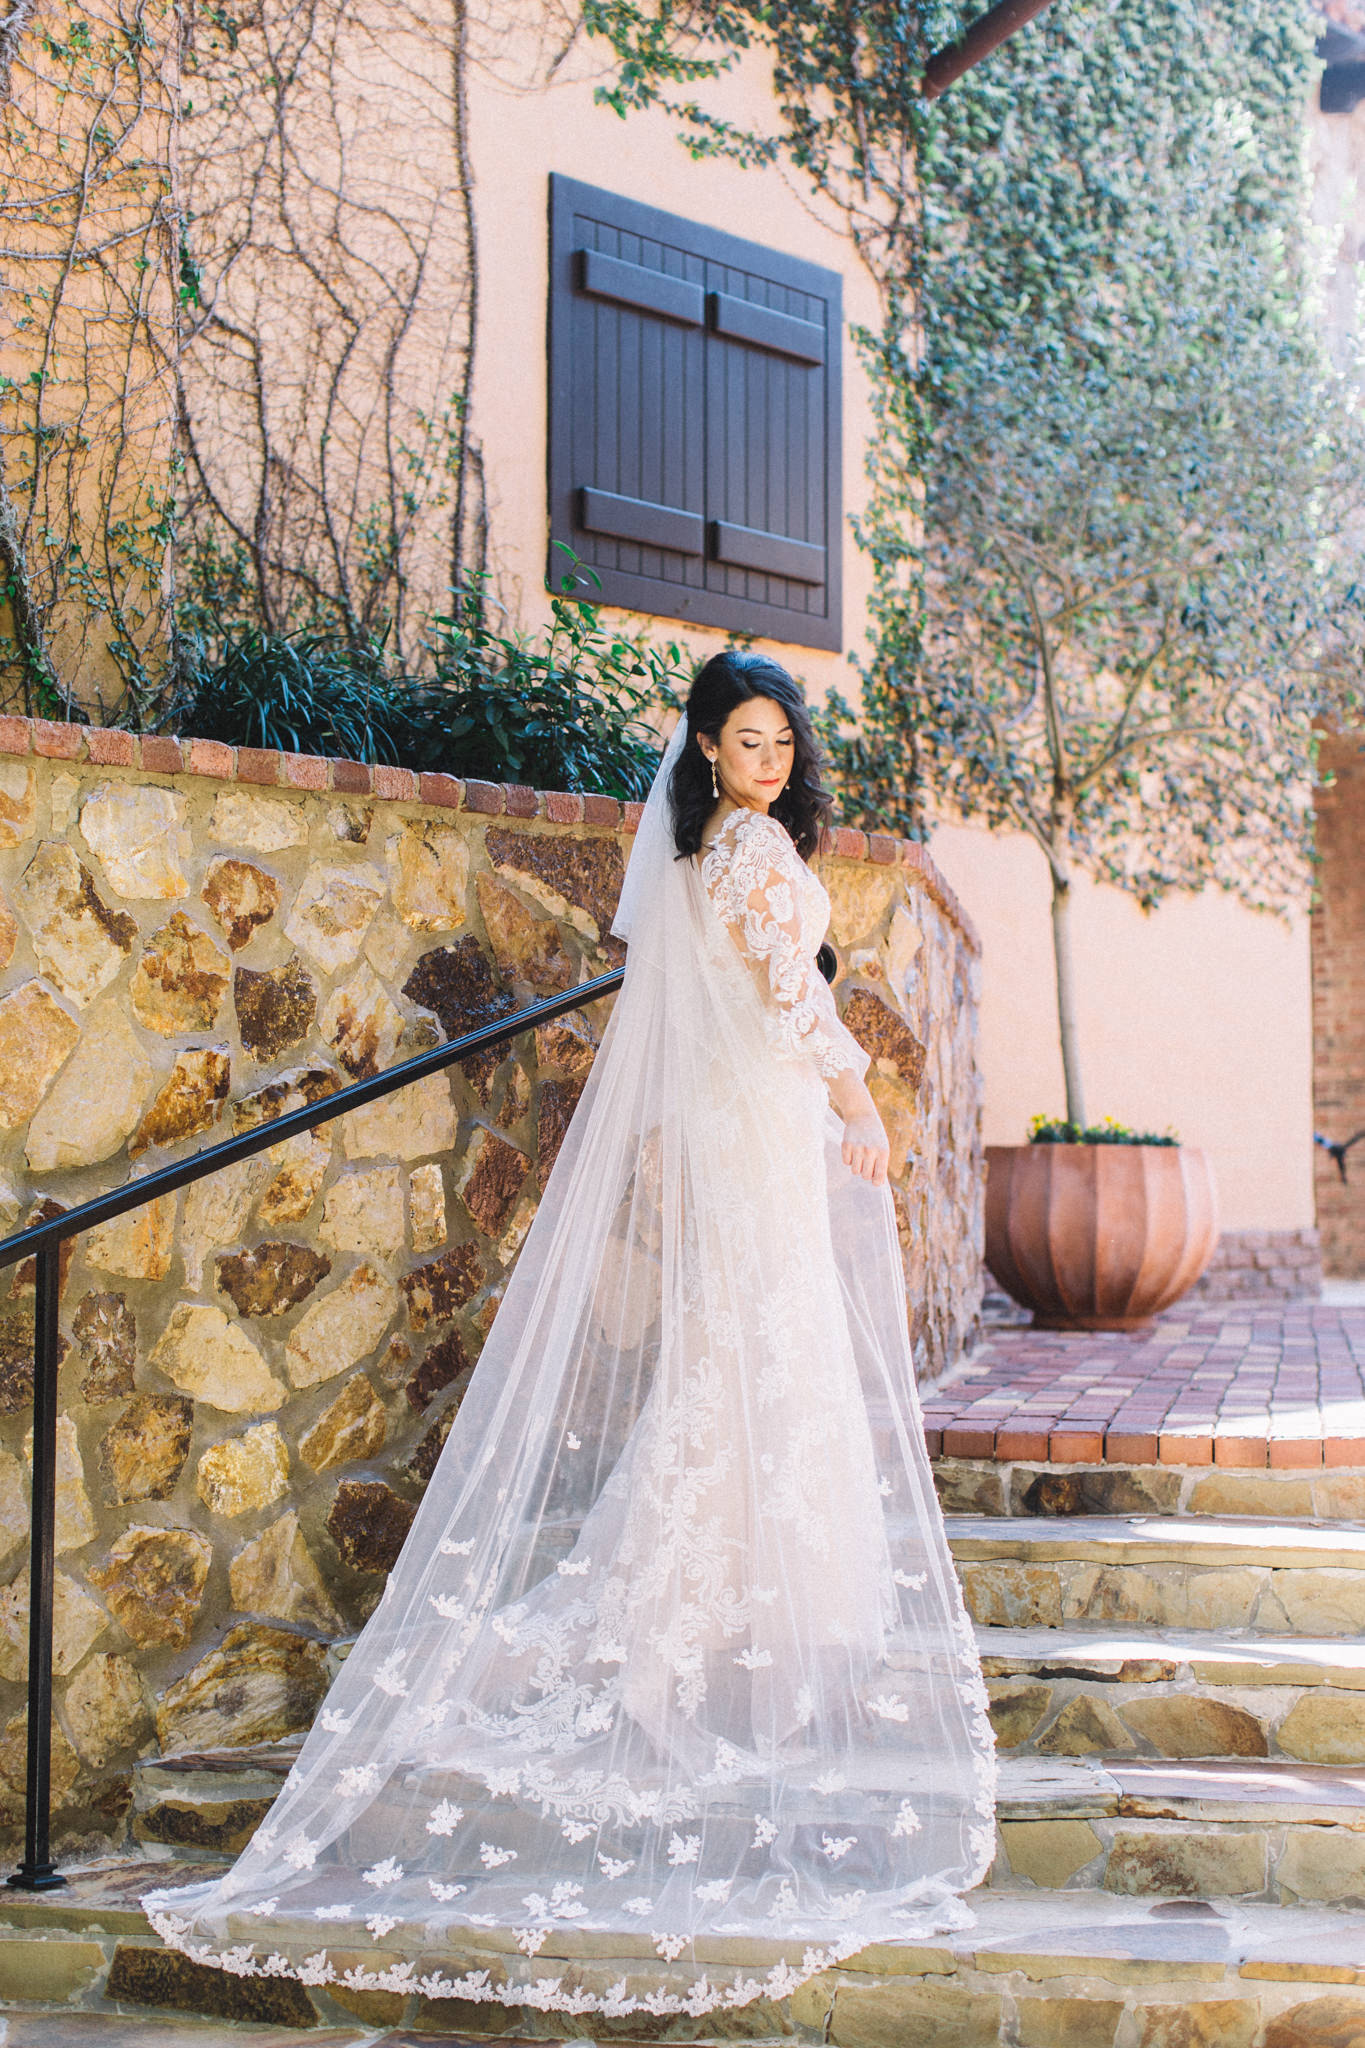 professional bride self portrait in wedding dress